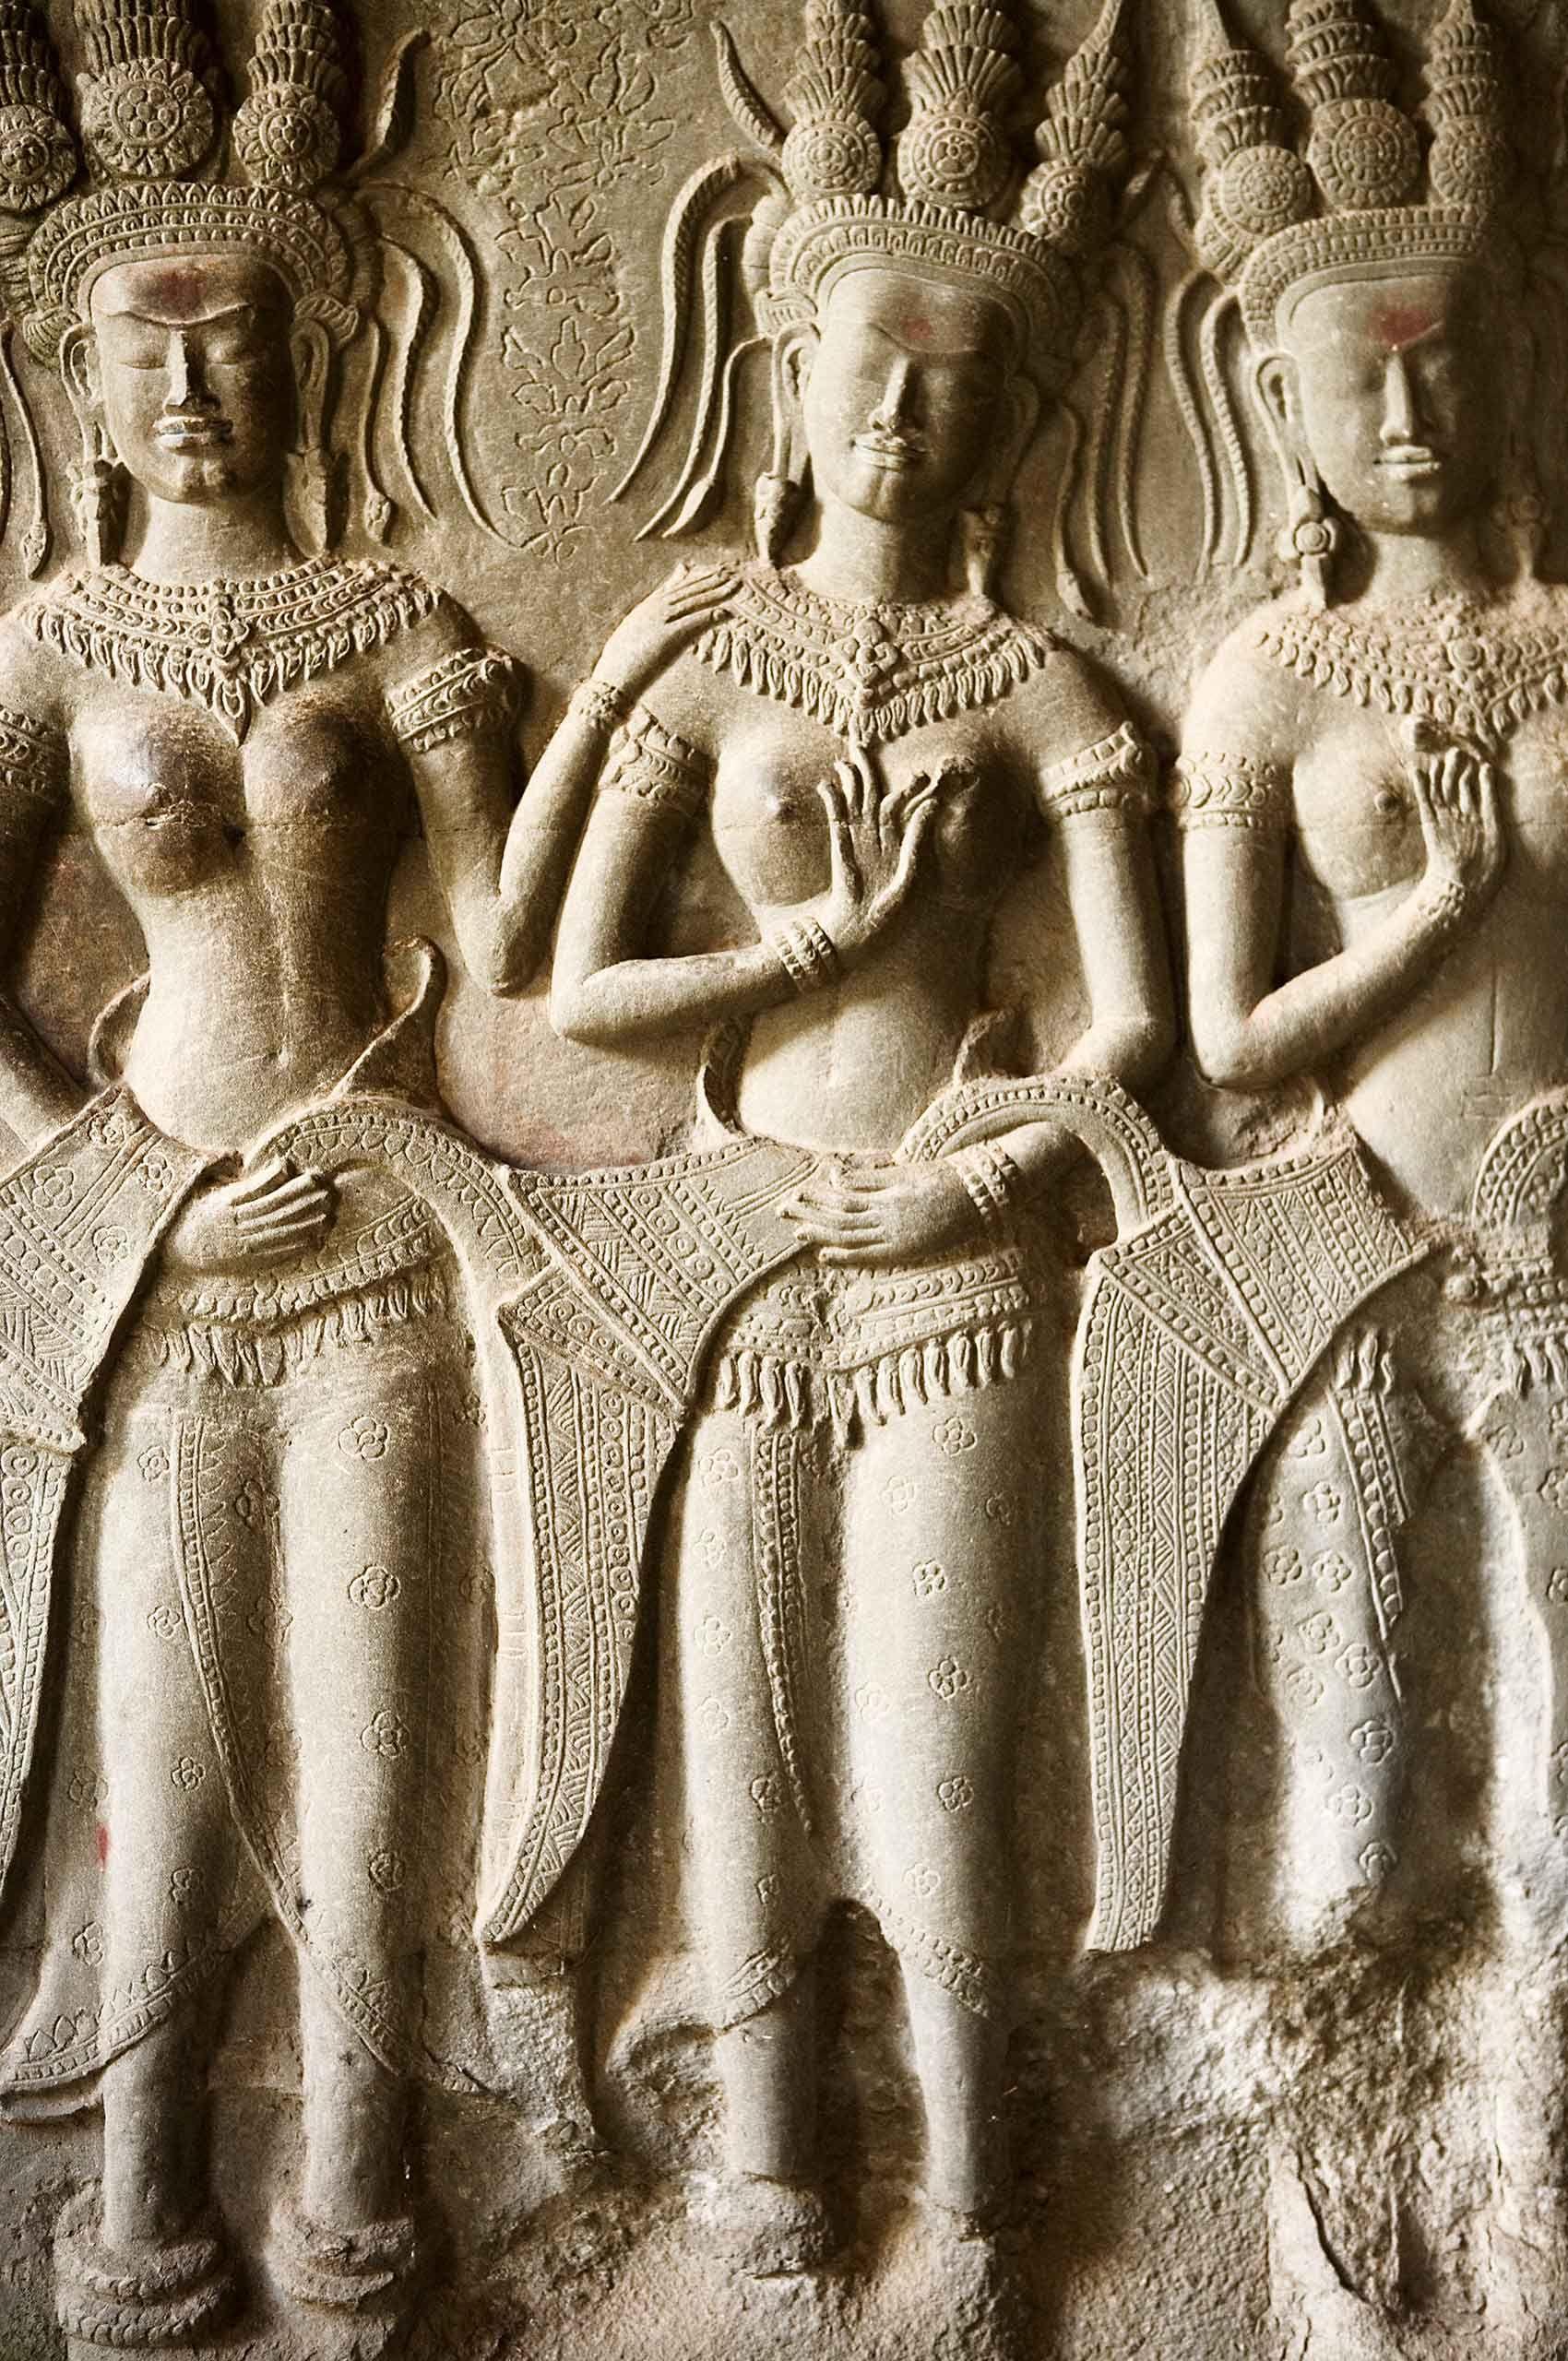 reliefs-angkorwat-cambodia-by-henrikolundphotography.jpg